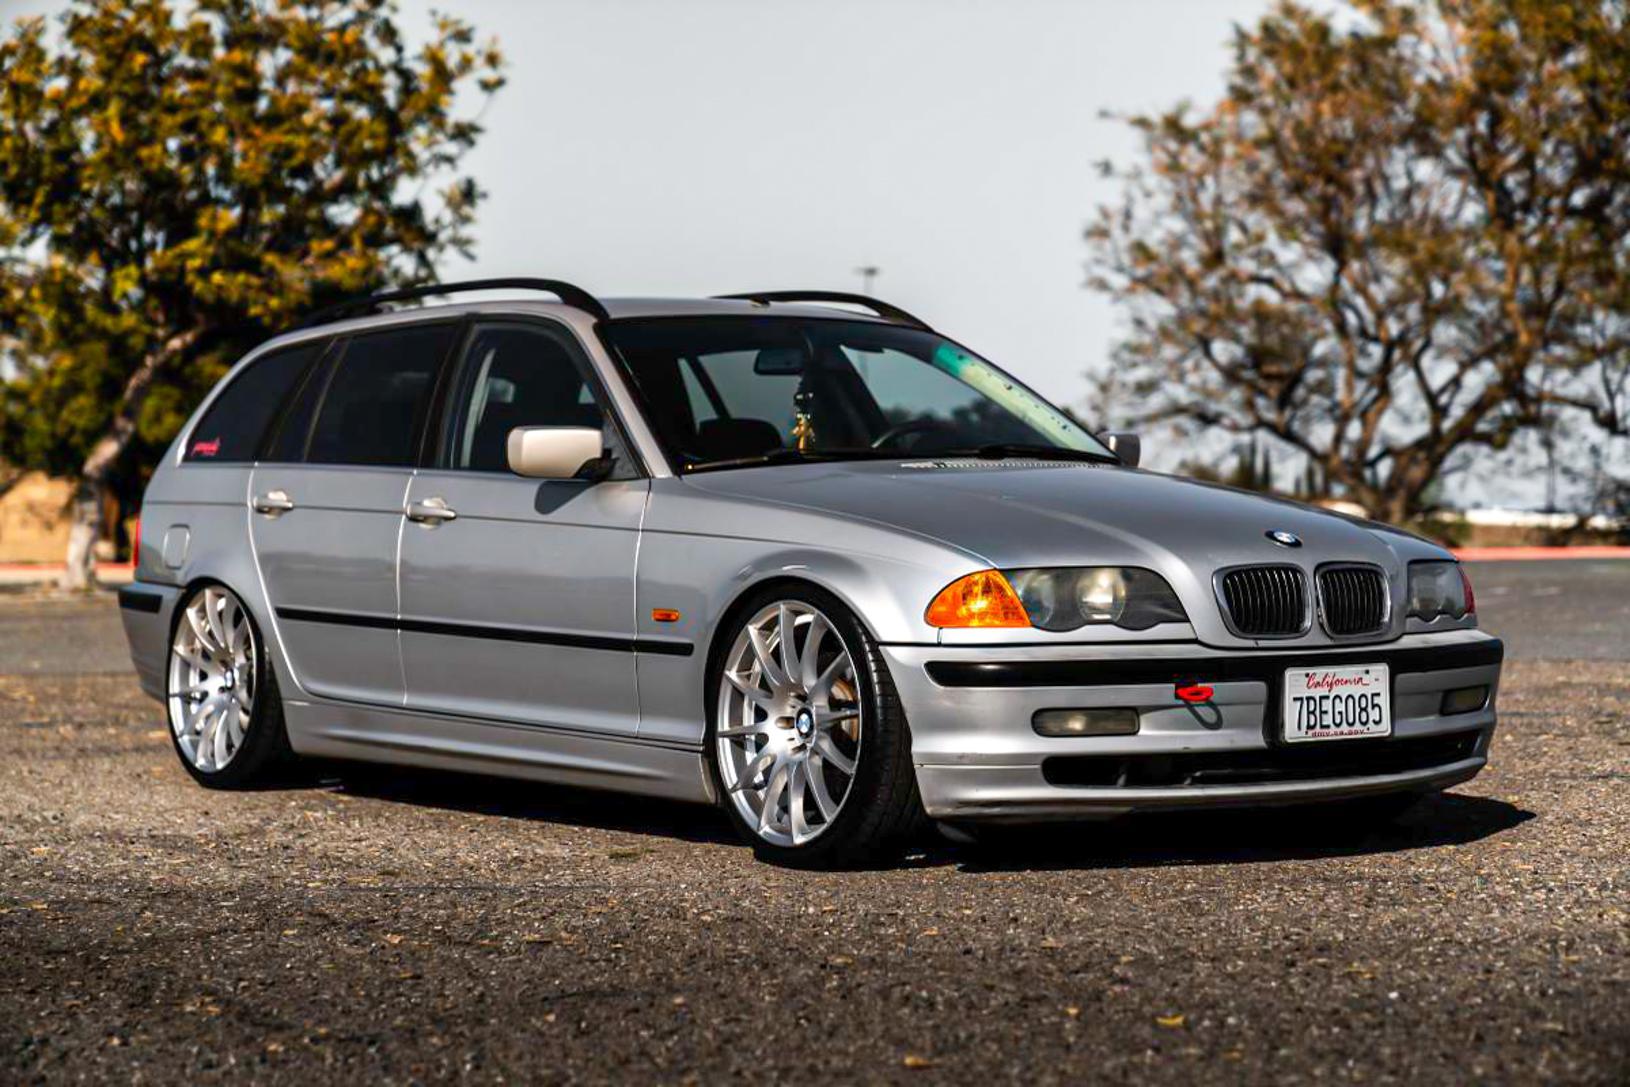 2001 BMW M3 Touring 'S54 Swap'